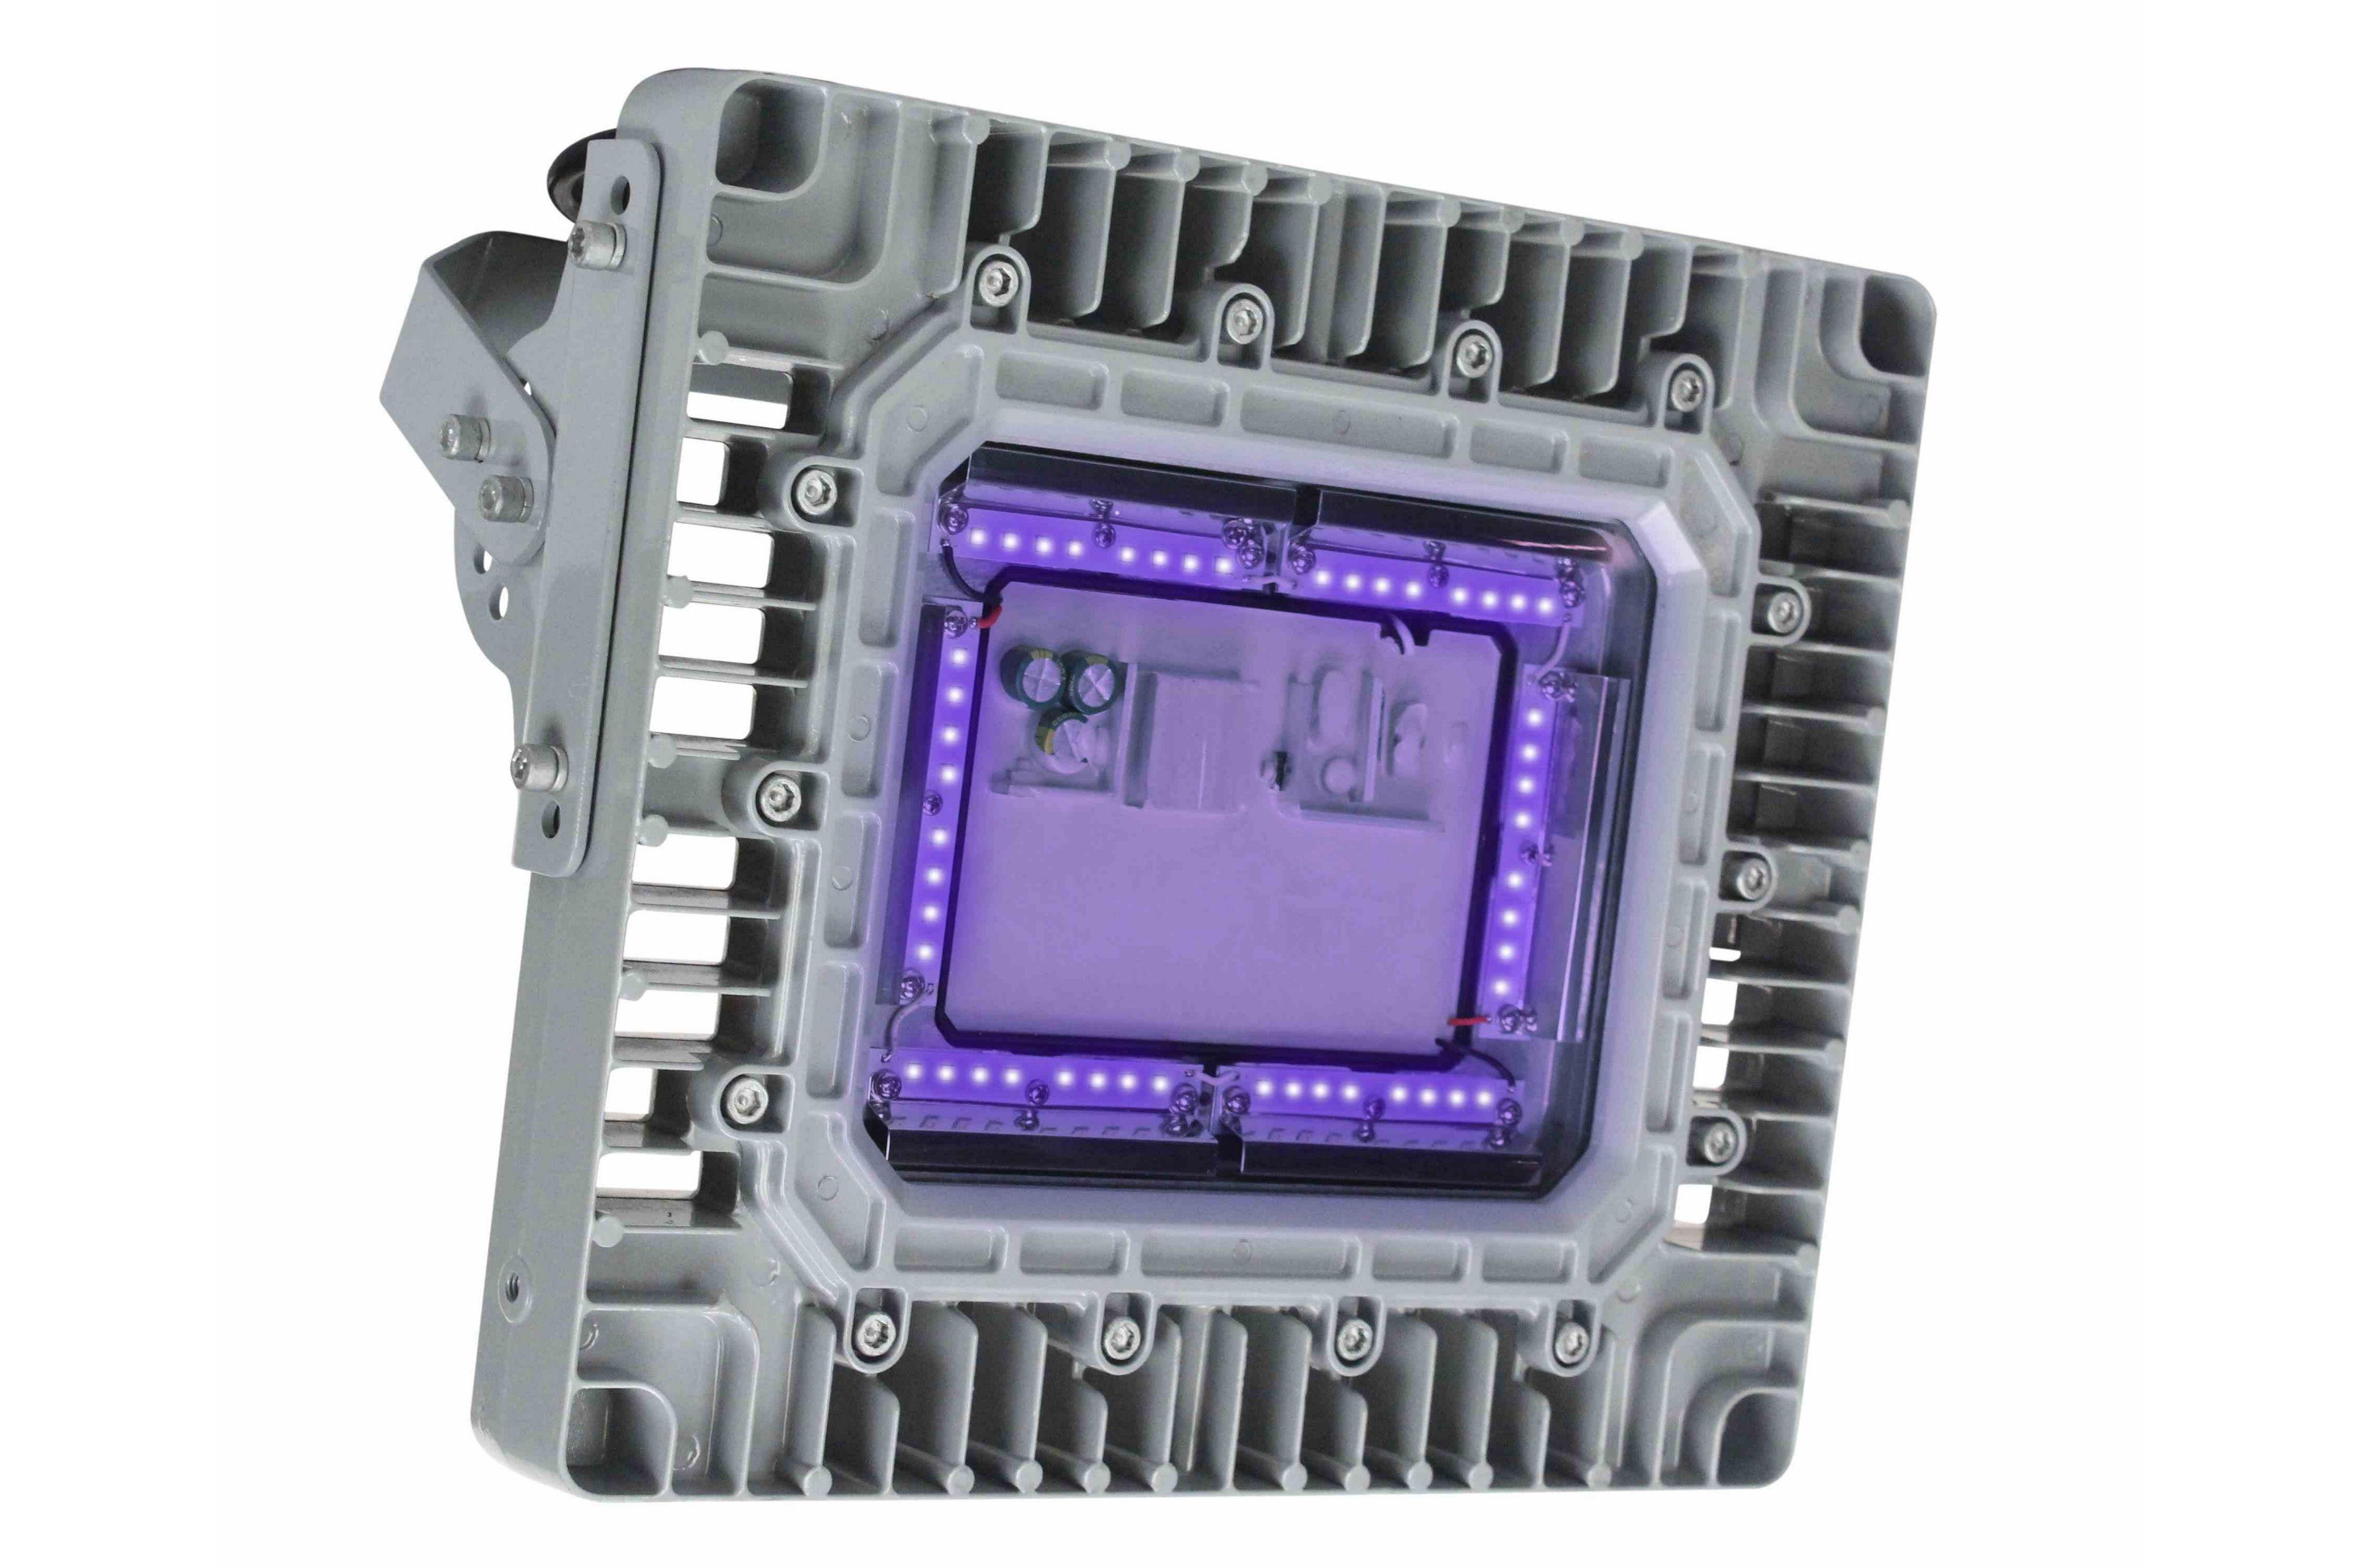 Industrial 100 Watt Ultraviolet Led Light Fixture Paint Spray Boost Driver For Hb Leds Hi Res Image 1 Main